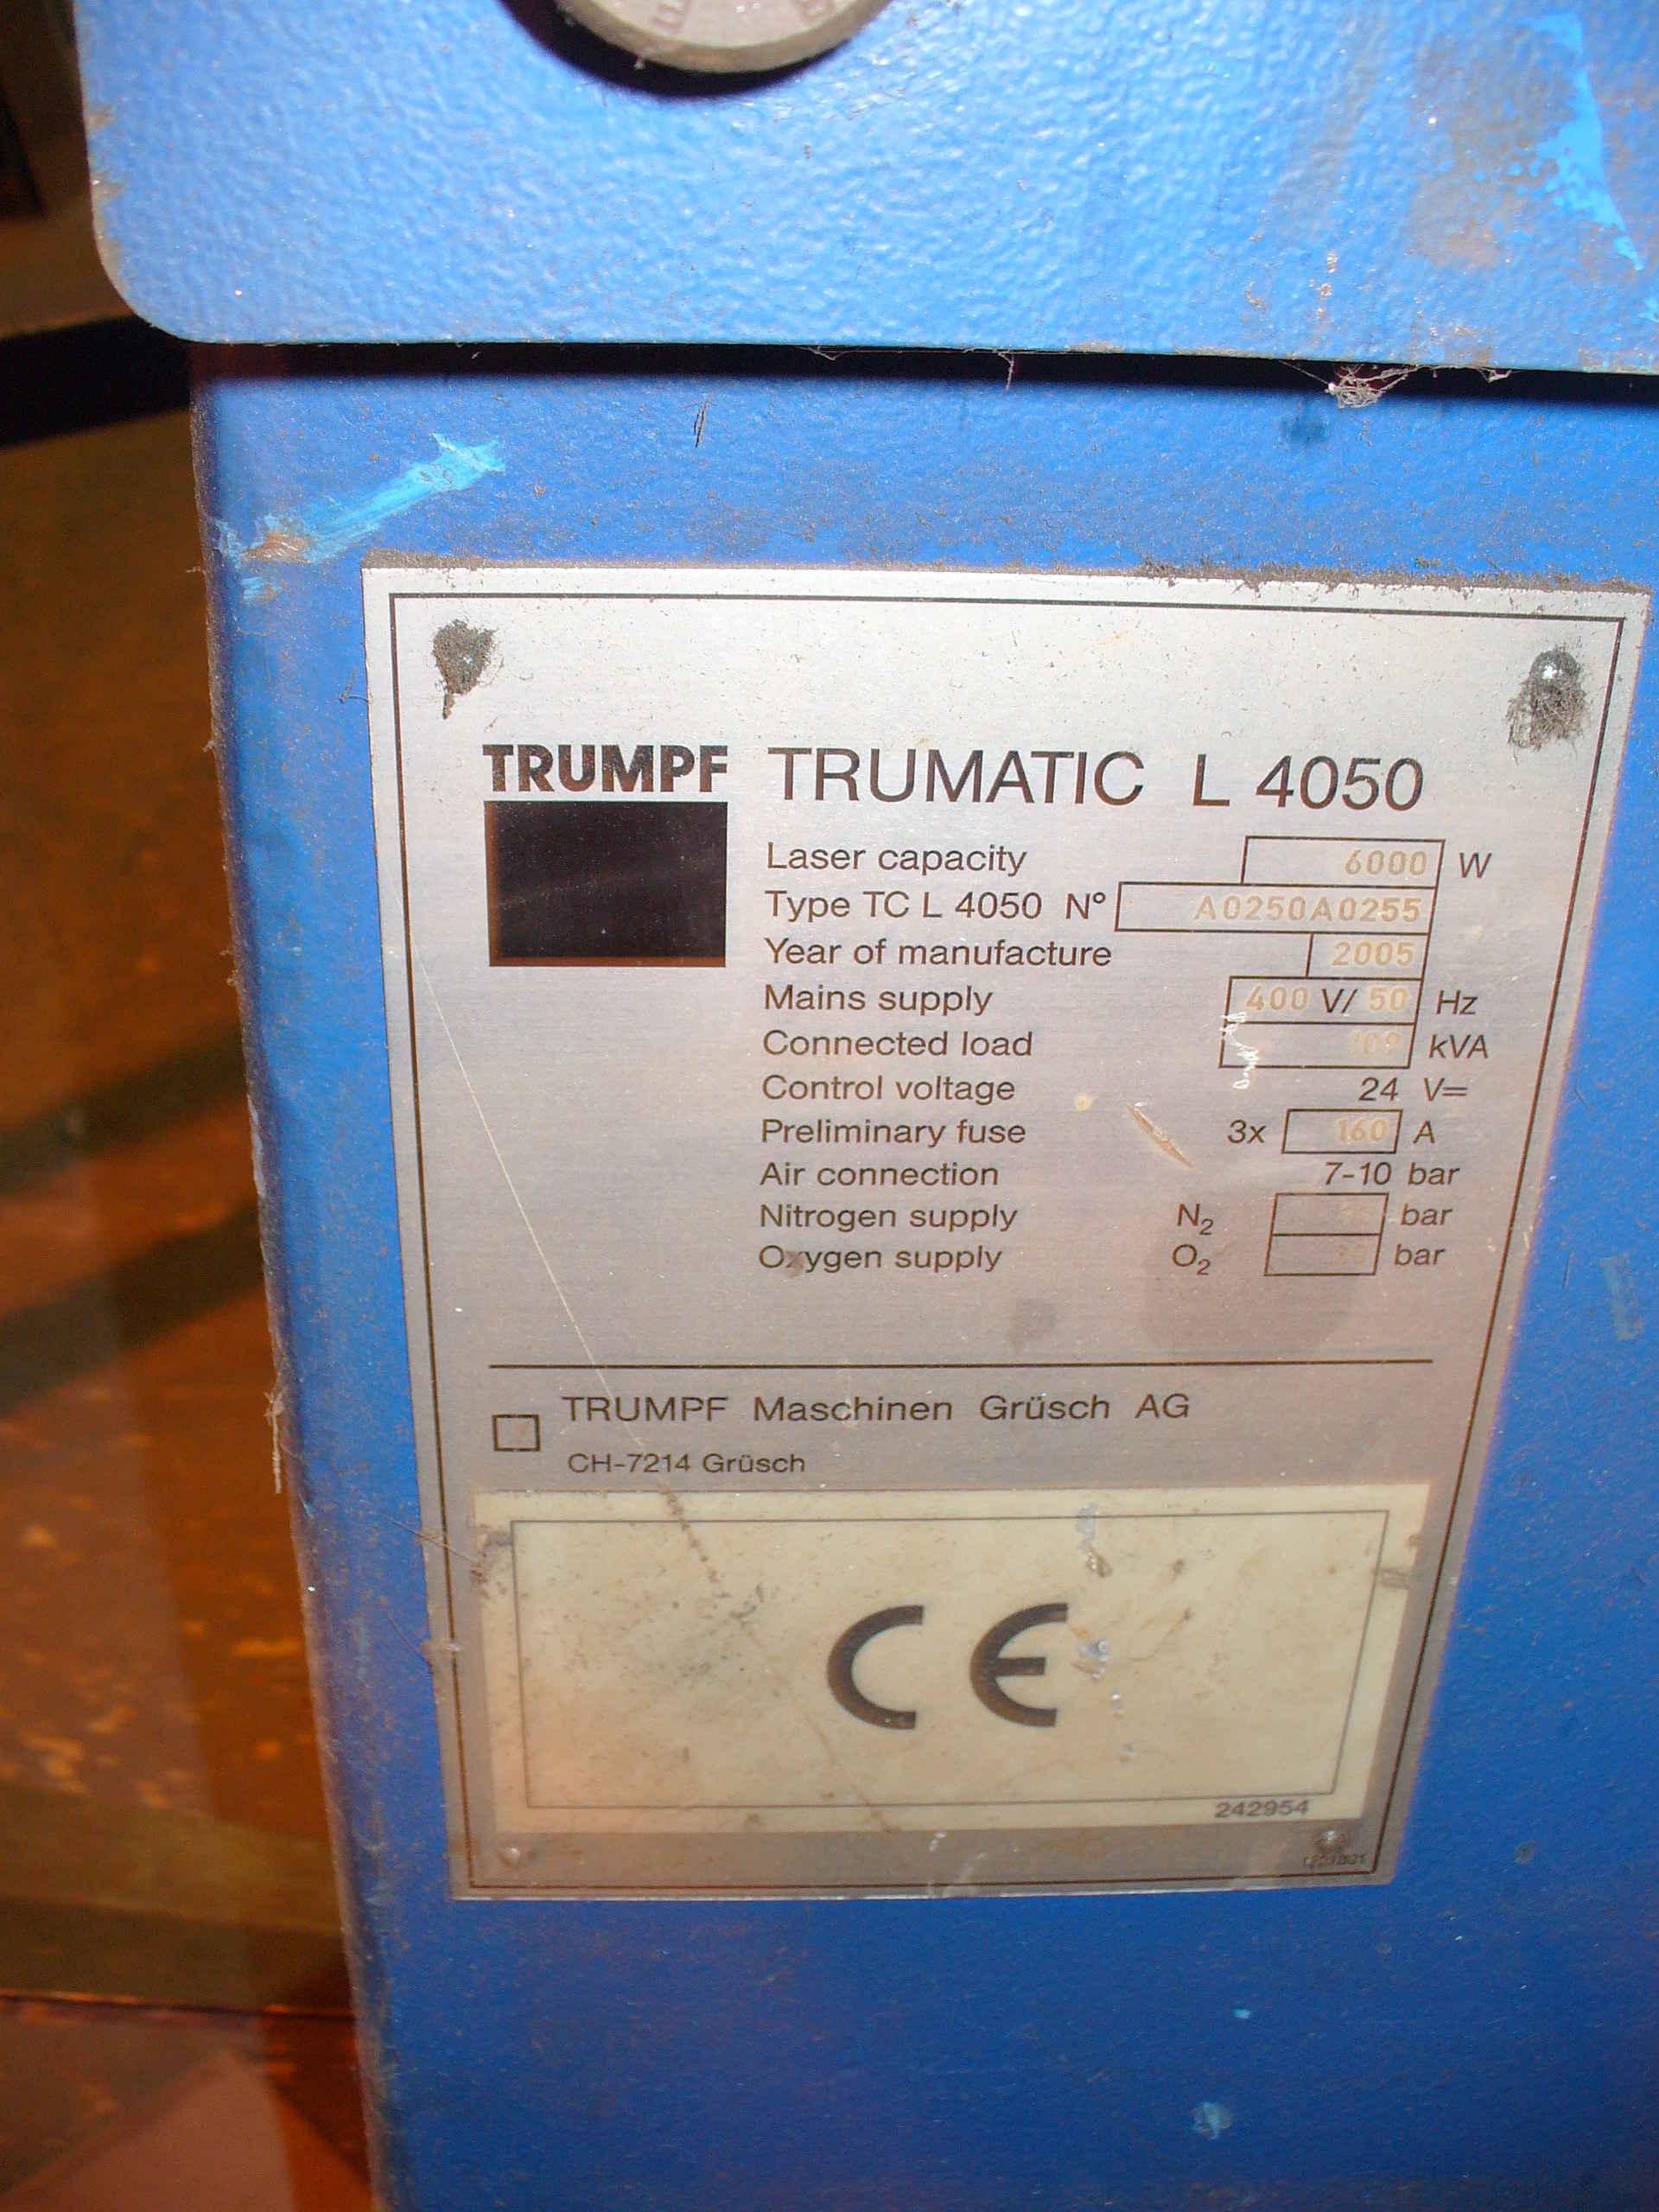 Lot 452 - 2005 Trumpf Trumatic L4050 4m x 2.0m - 6kw LASER PROFILE MACHINE